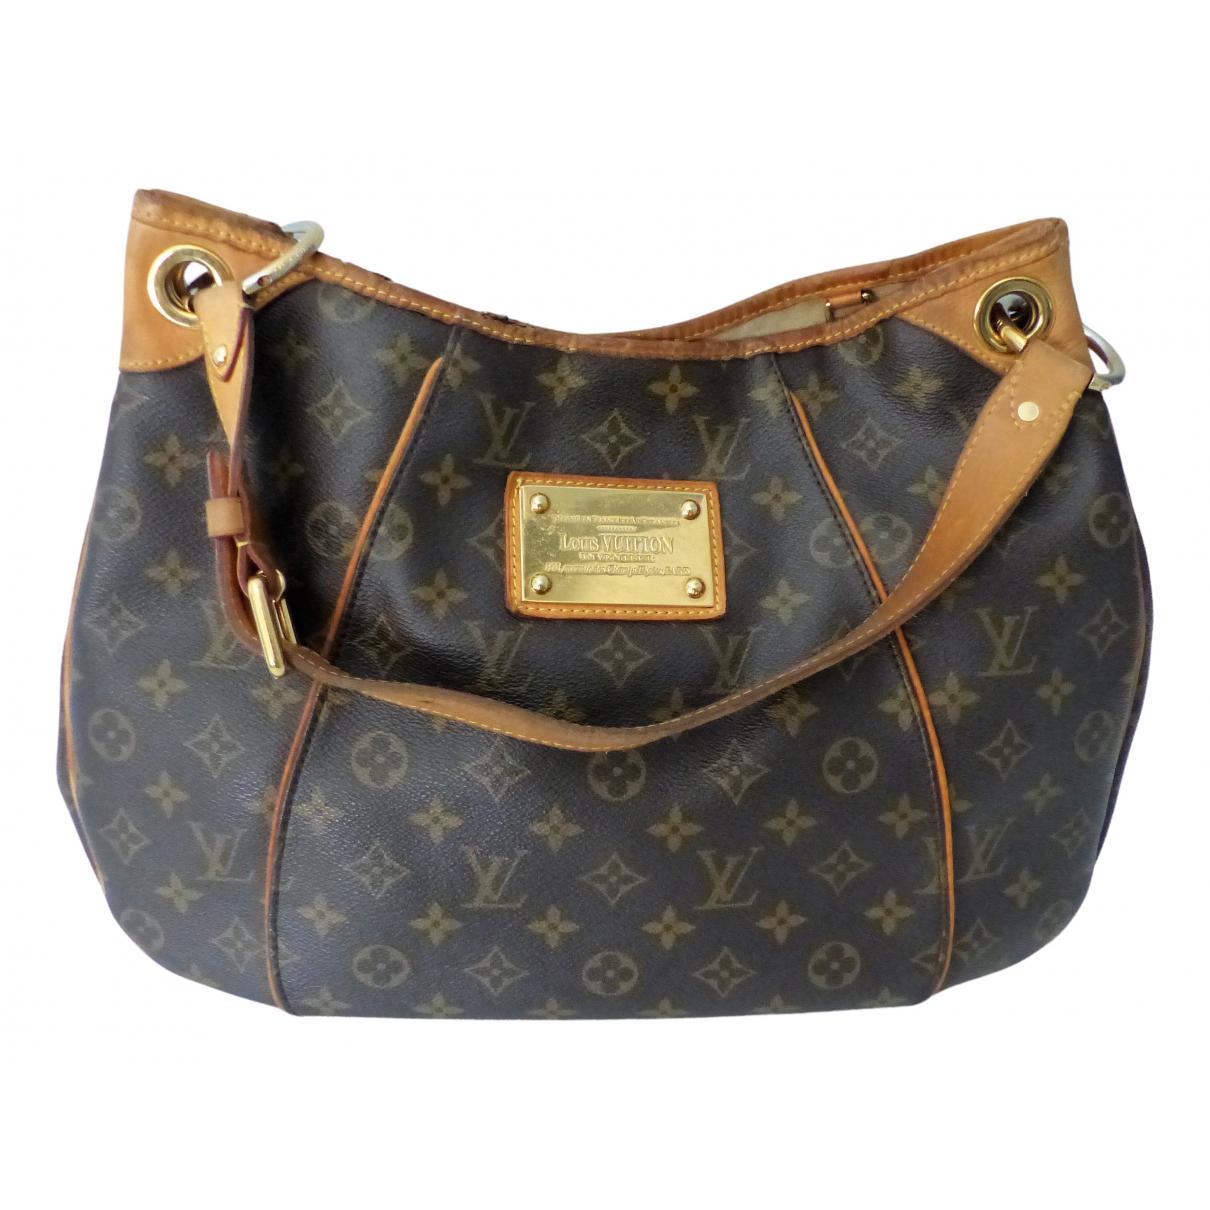 Louis Vuitton - Sac a main Galliera pour femme en toile - marron